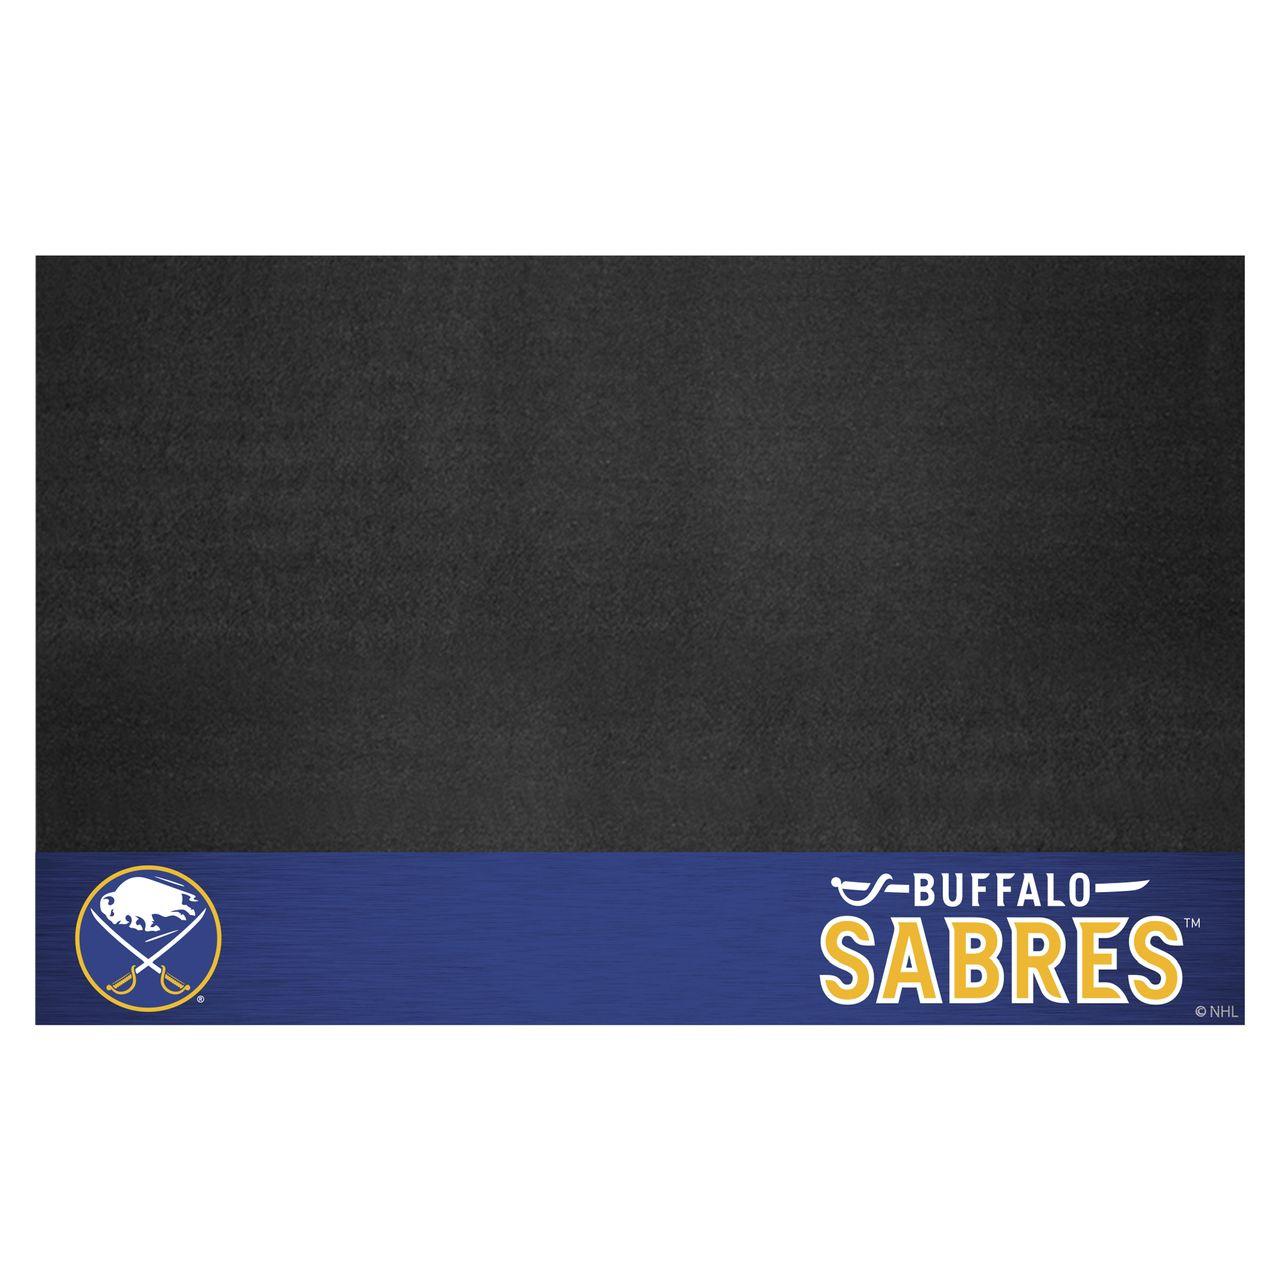 "Fanmats 14227 NHL - Buffalo Sabres Grill Mat 26""x42"""